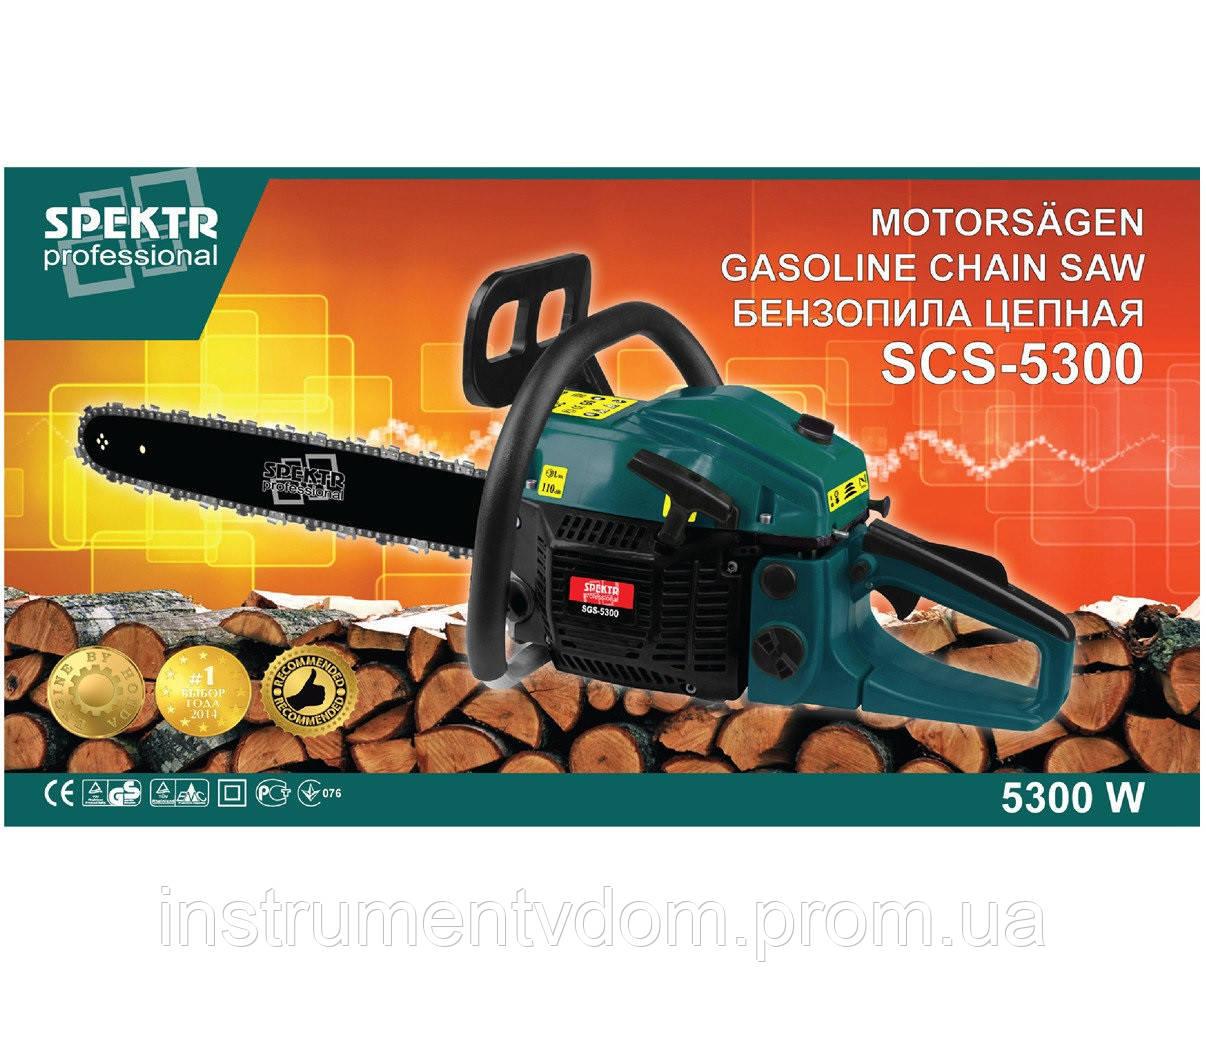 Бензопила Spektr 45-5300 (2 шины/2 цепи)